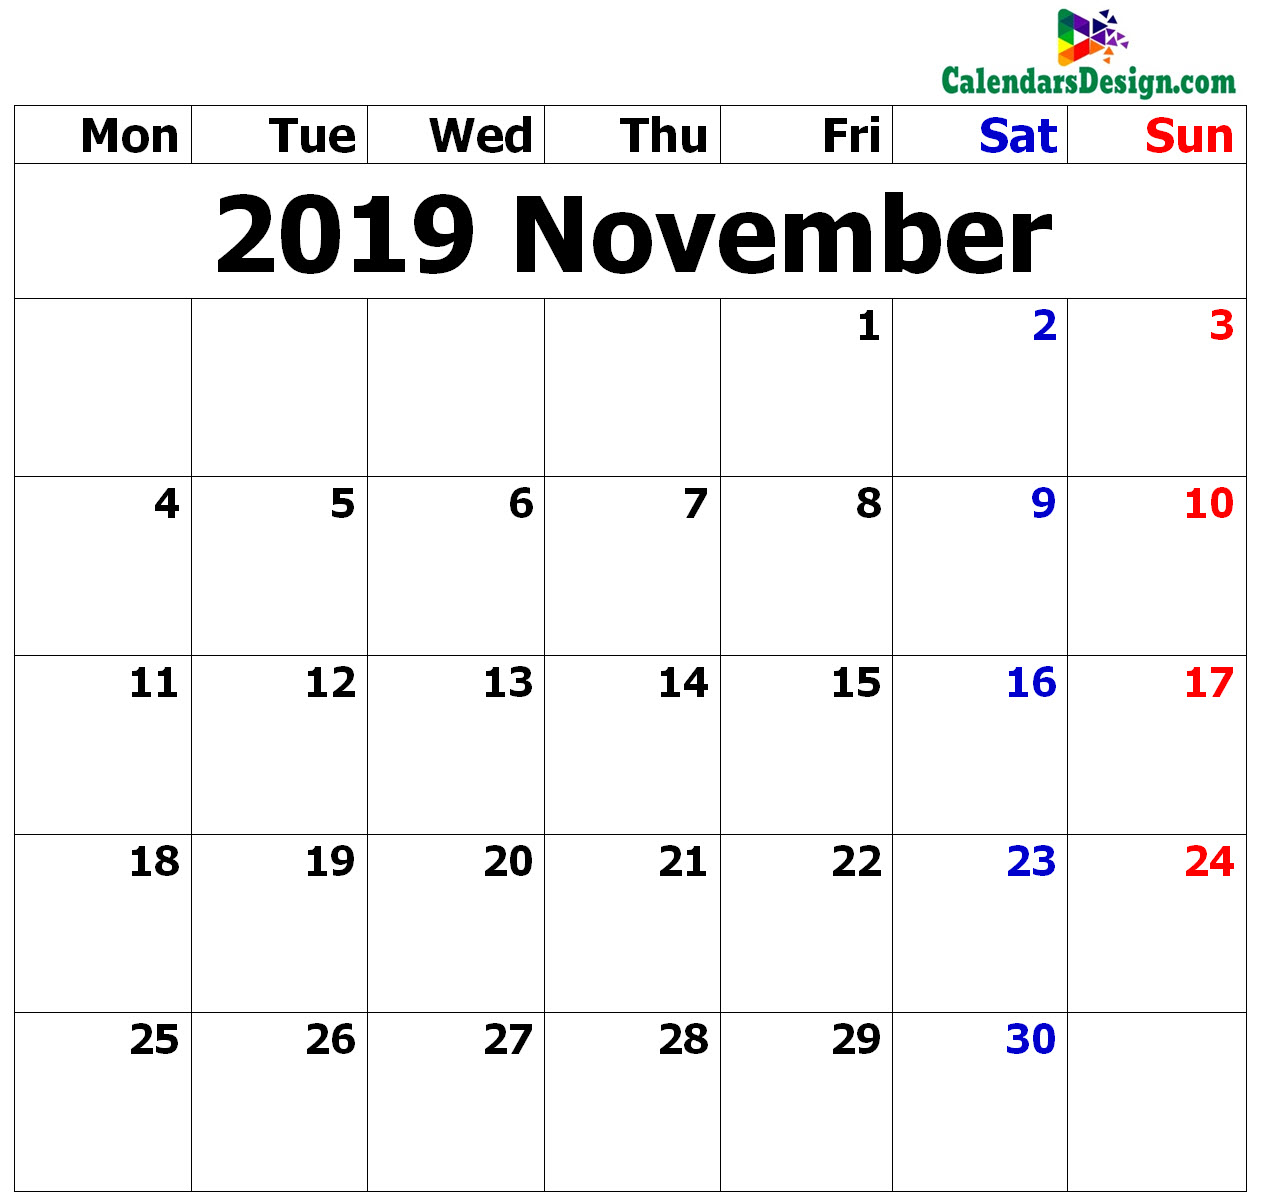 November Calendar 2019 in Excel Format